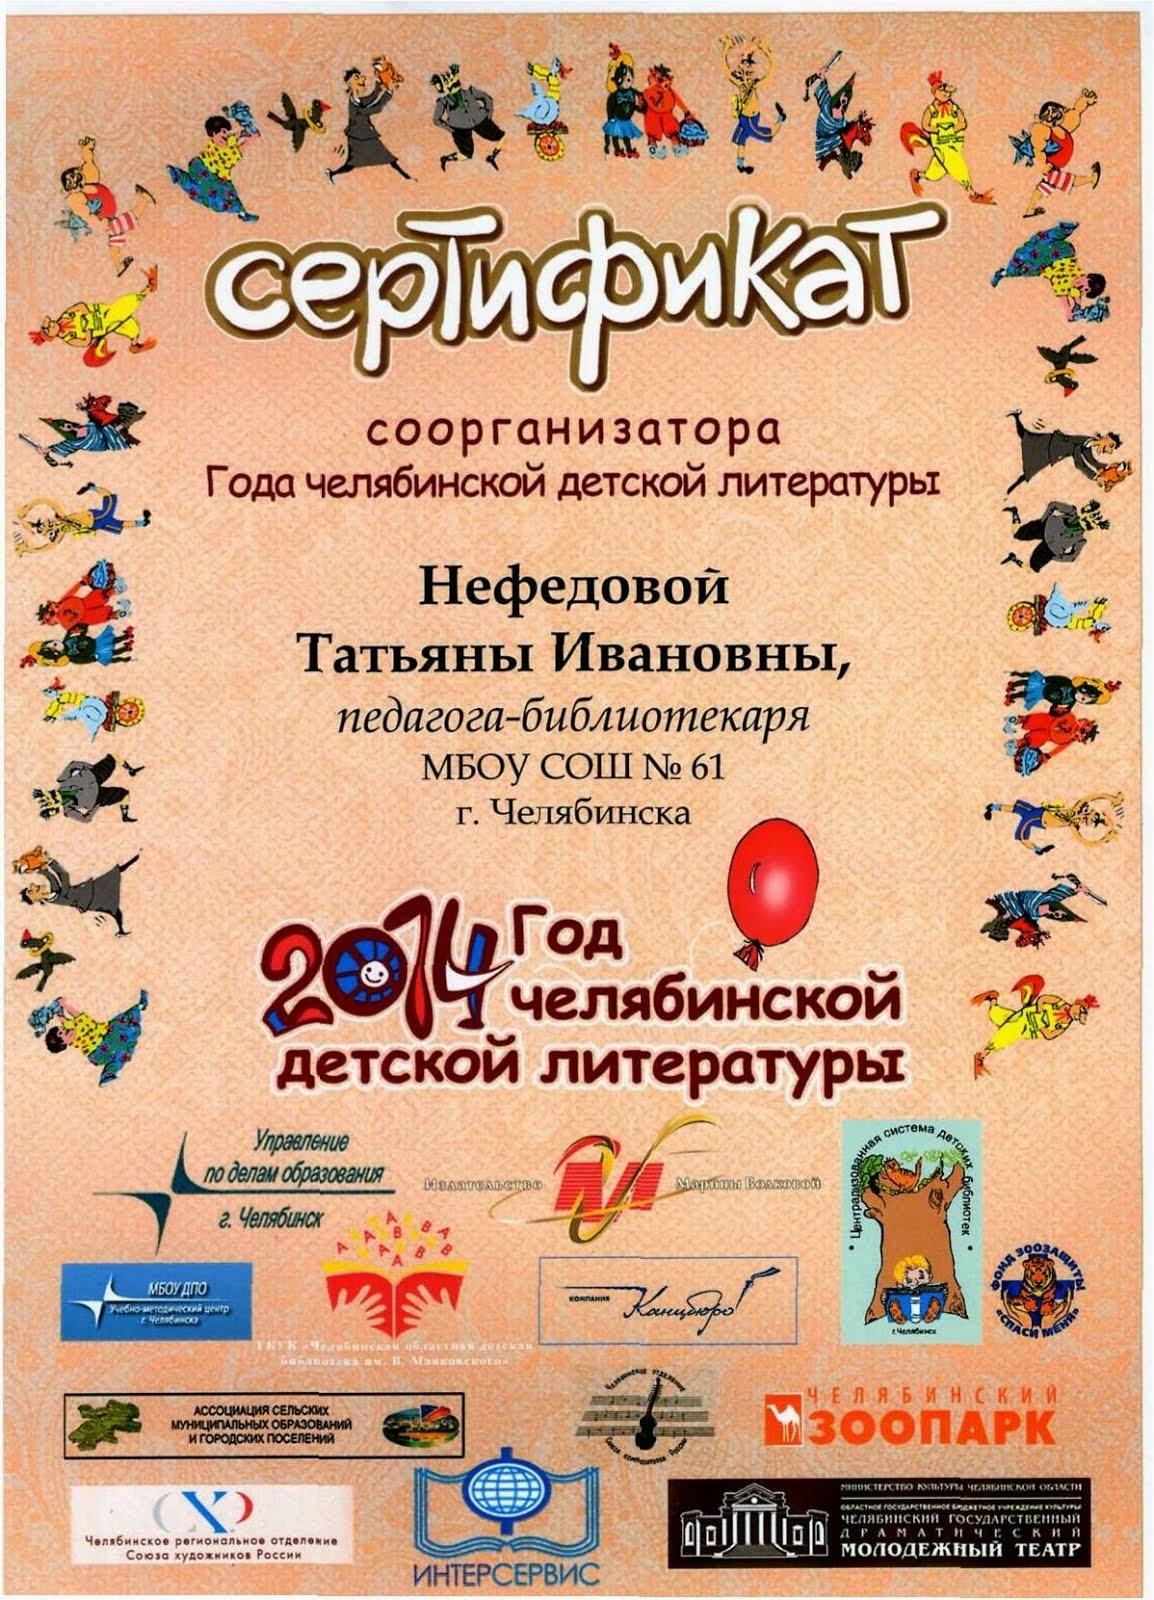 Сертификат соорганизатора